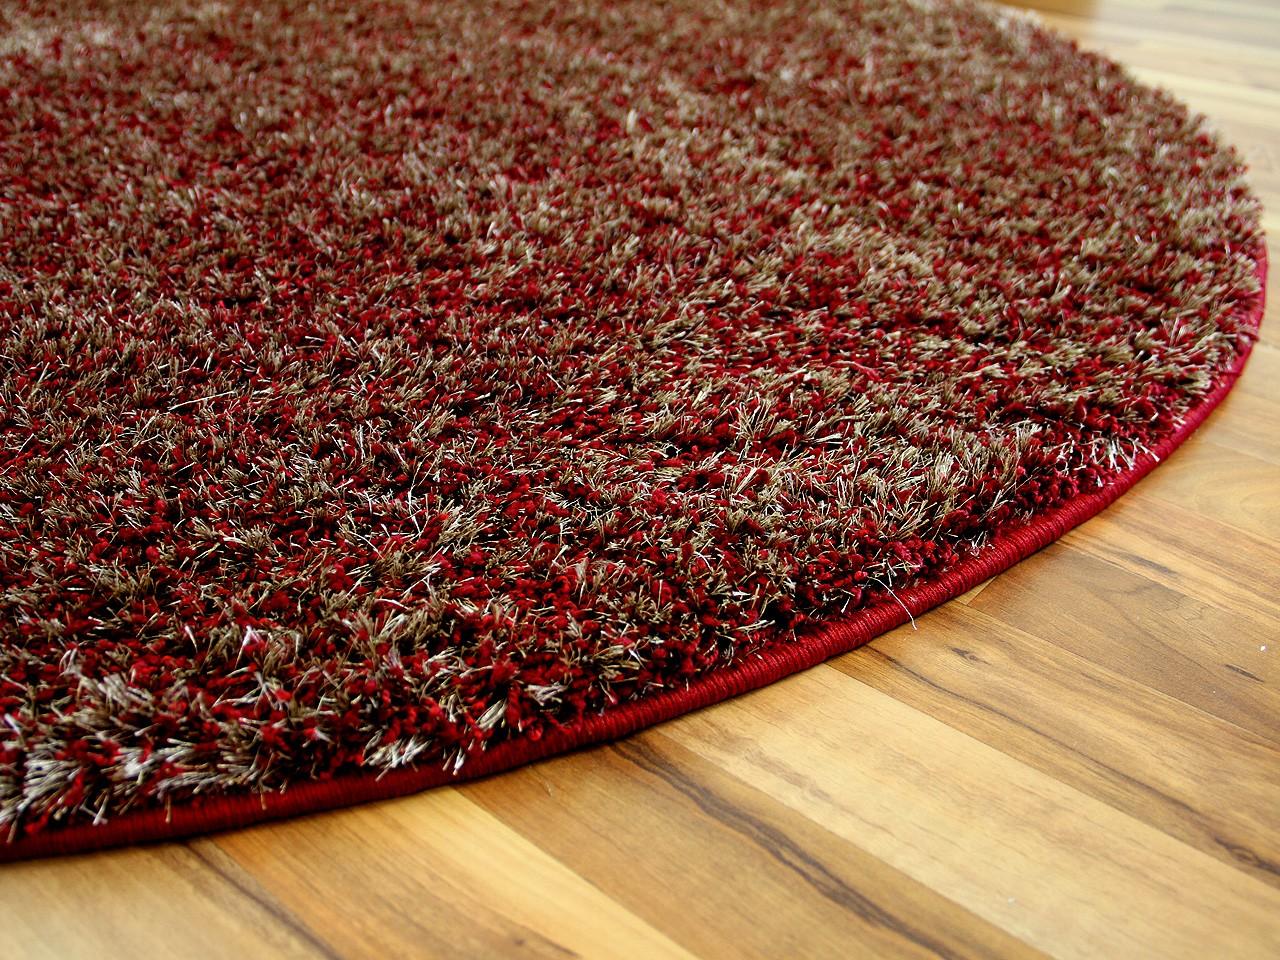 teppich rot rund top teppich rot grau great kinder teppich karo design multicolour grn konzept. Black Bedroom Furniture Sets. Home Design Ideas